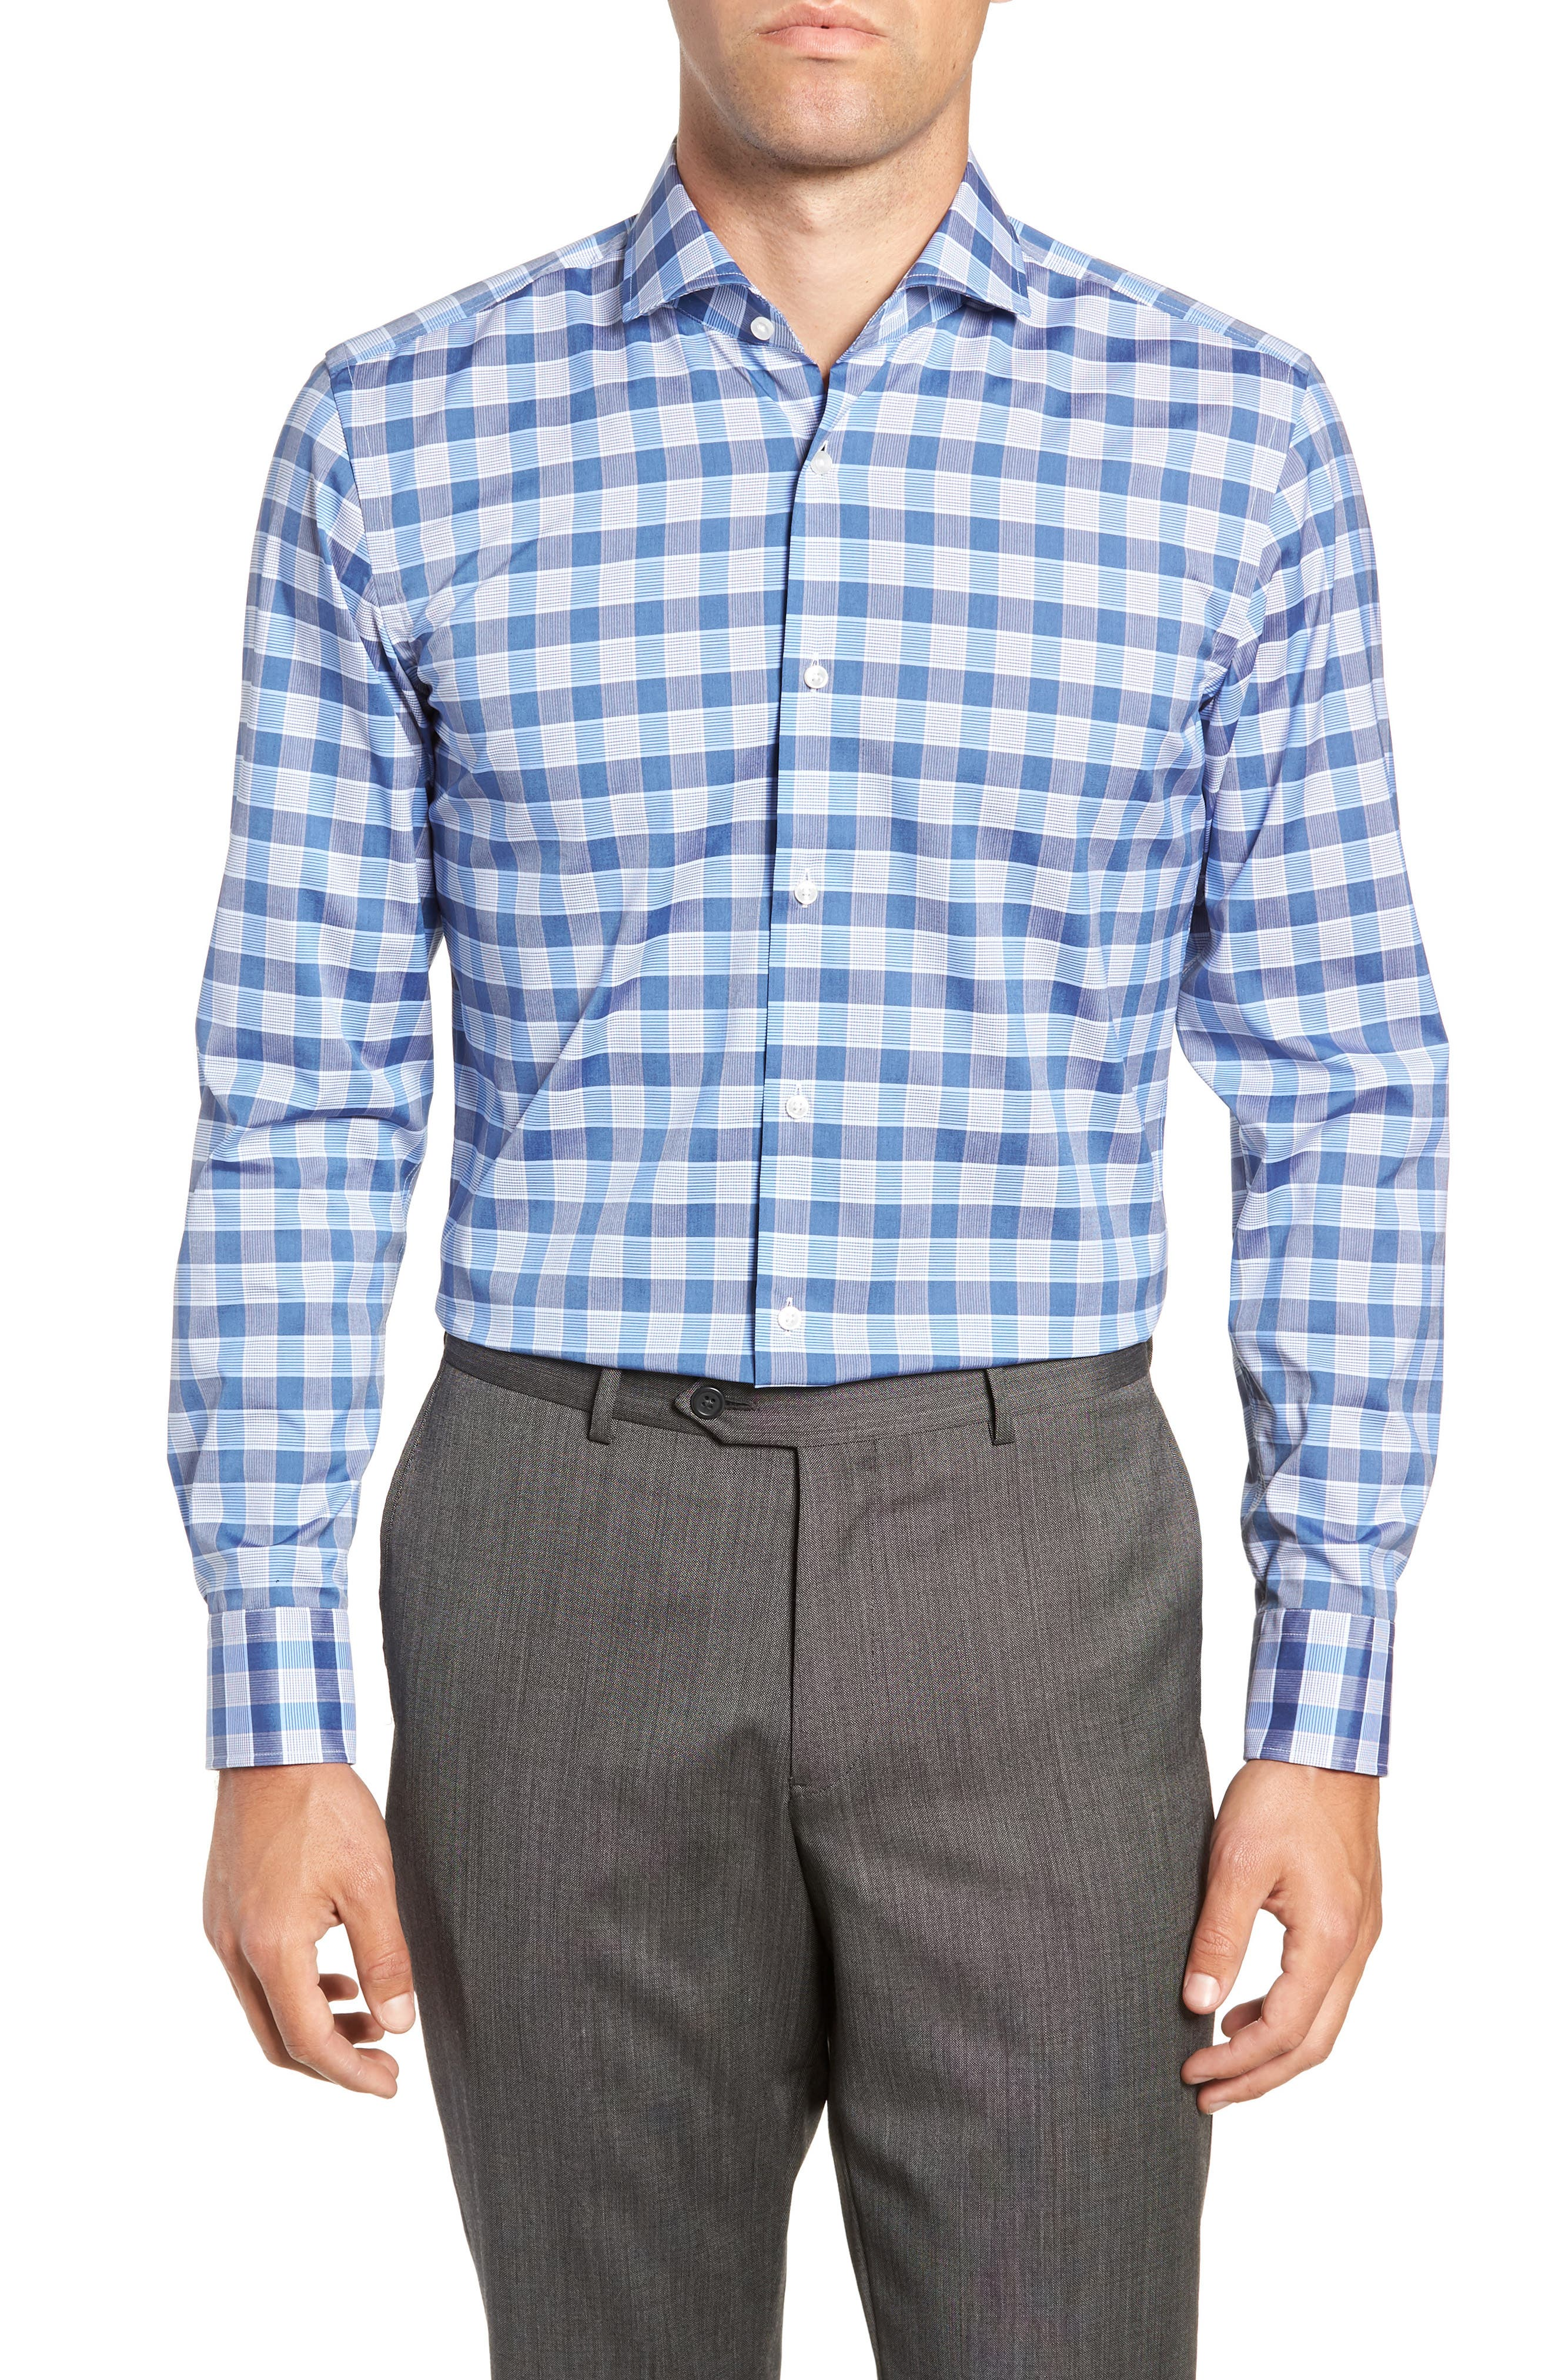 Jason Slim Fit Plaid Dress Shirt,                         Main,                         color, BLUE